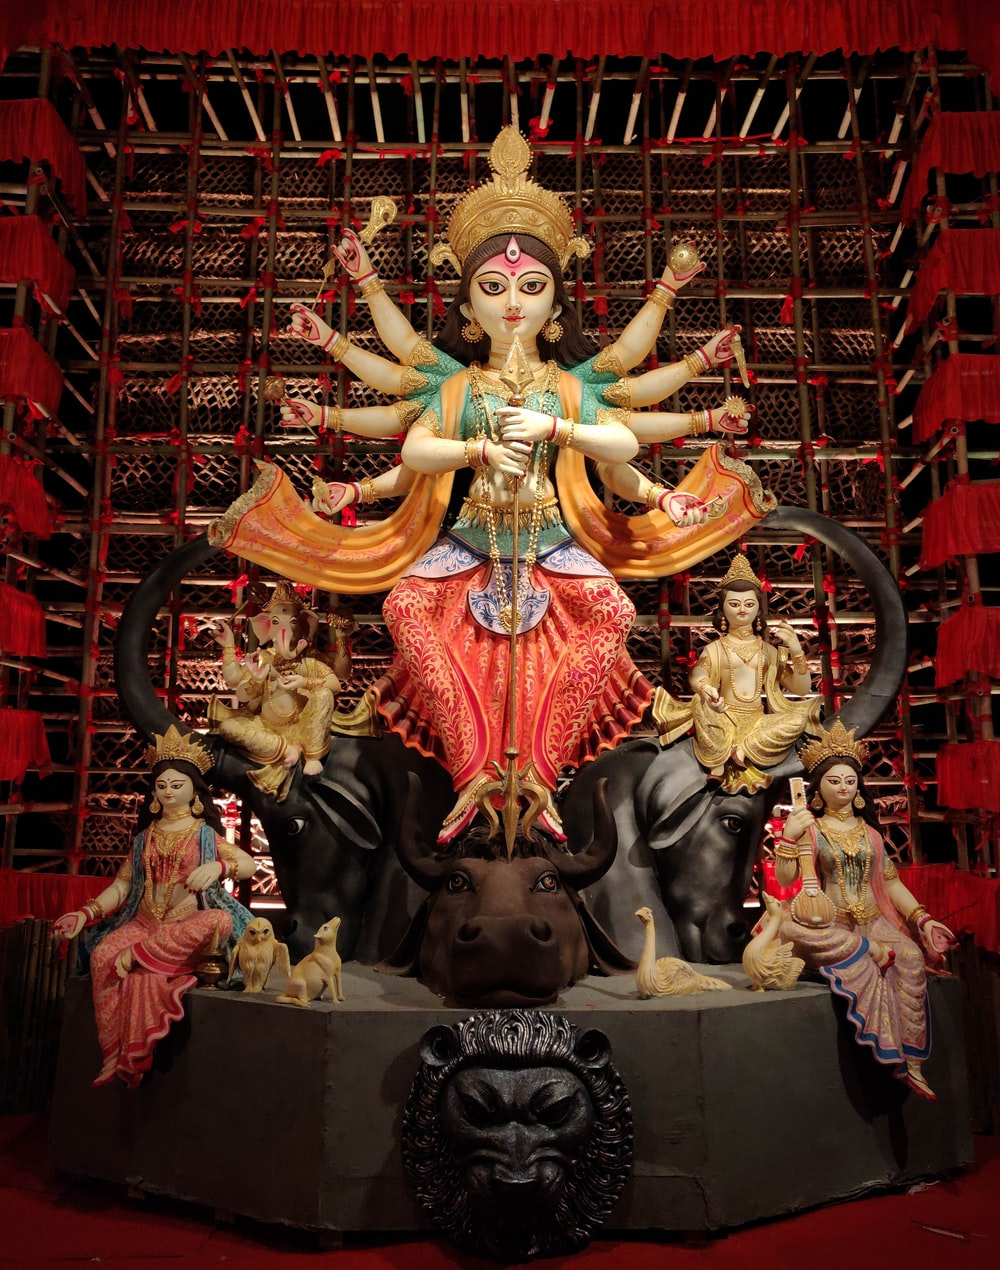 hindu deity statue on brown wooden table